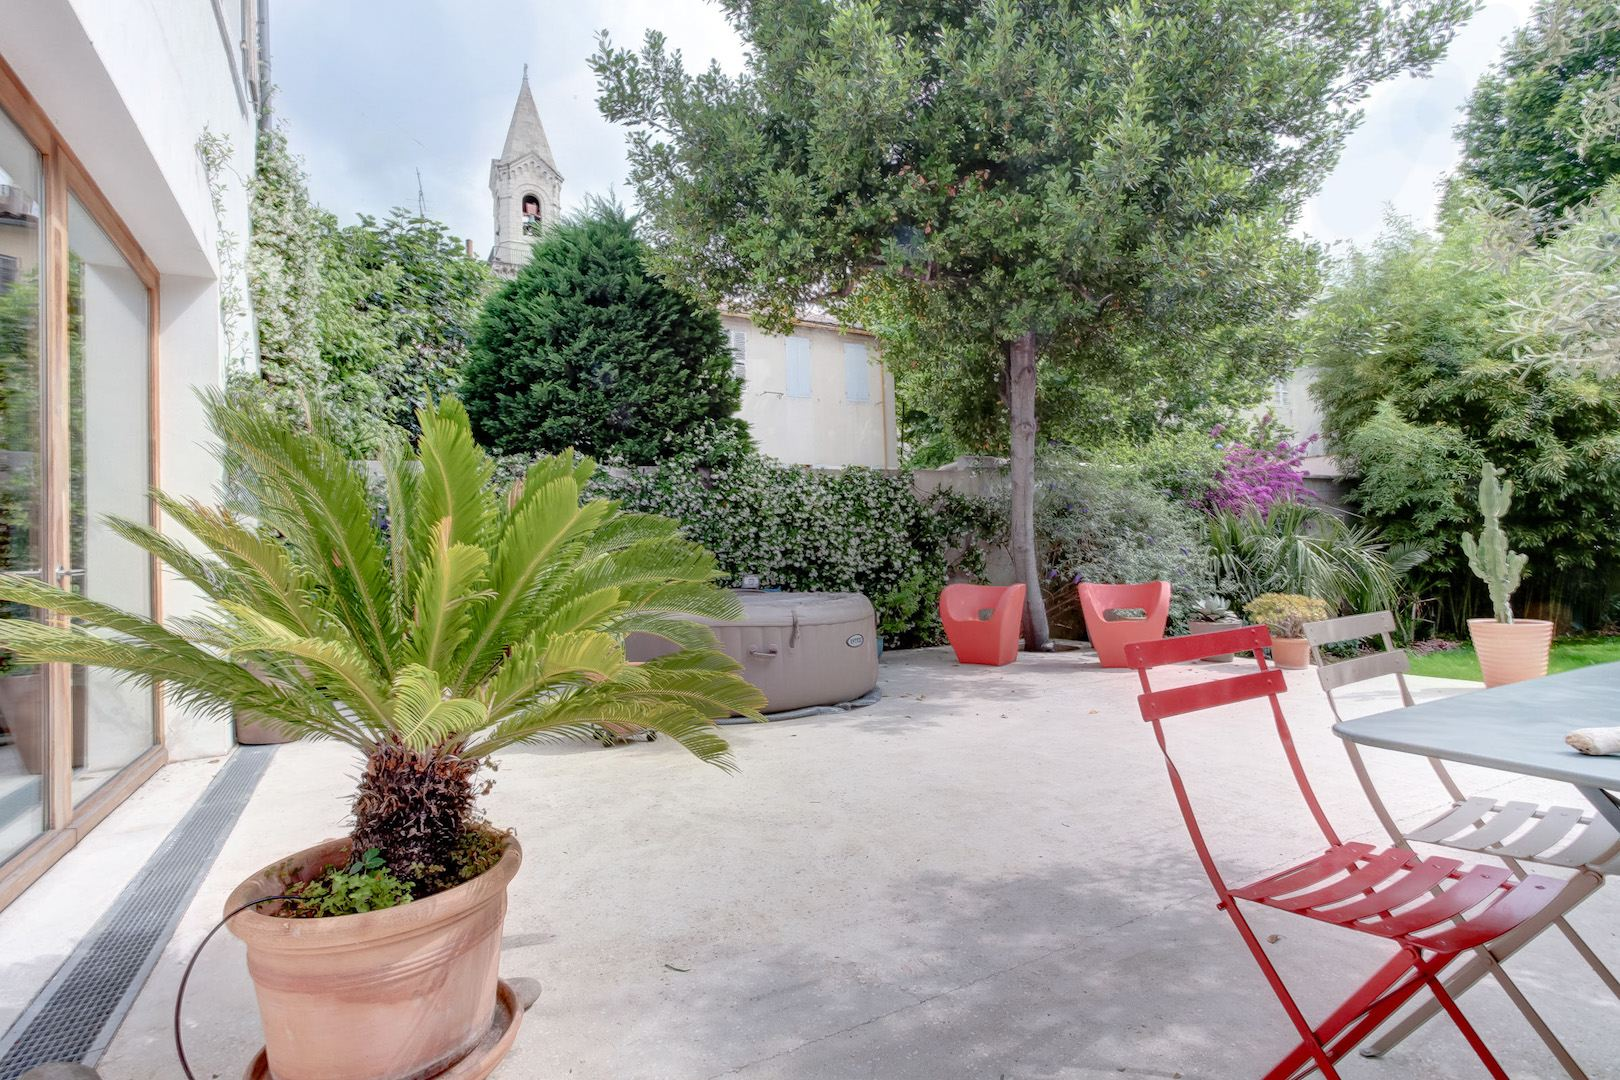 Maison pour une grande famille moderne dans le 5 me ma terrasse marseille - Terrasse jardin londrina quadra marseille ...